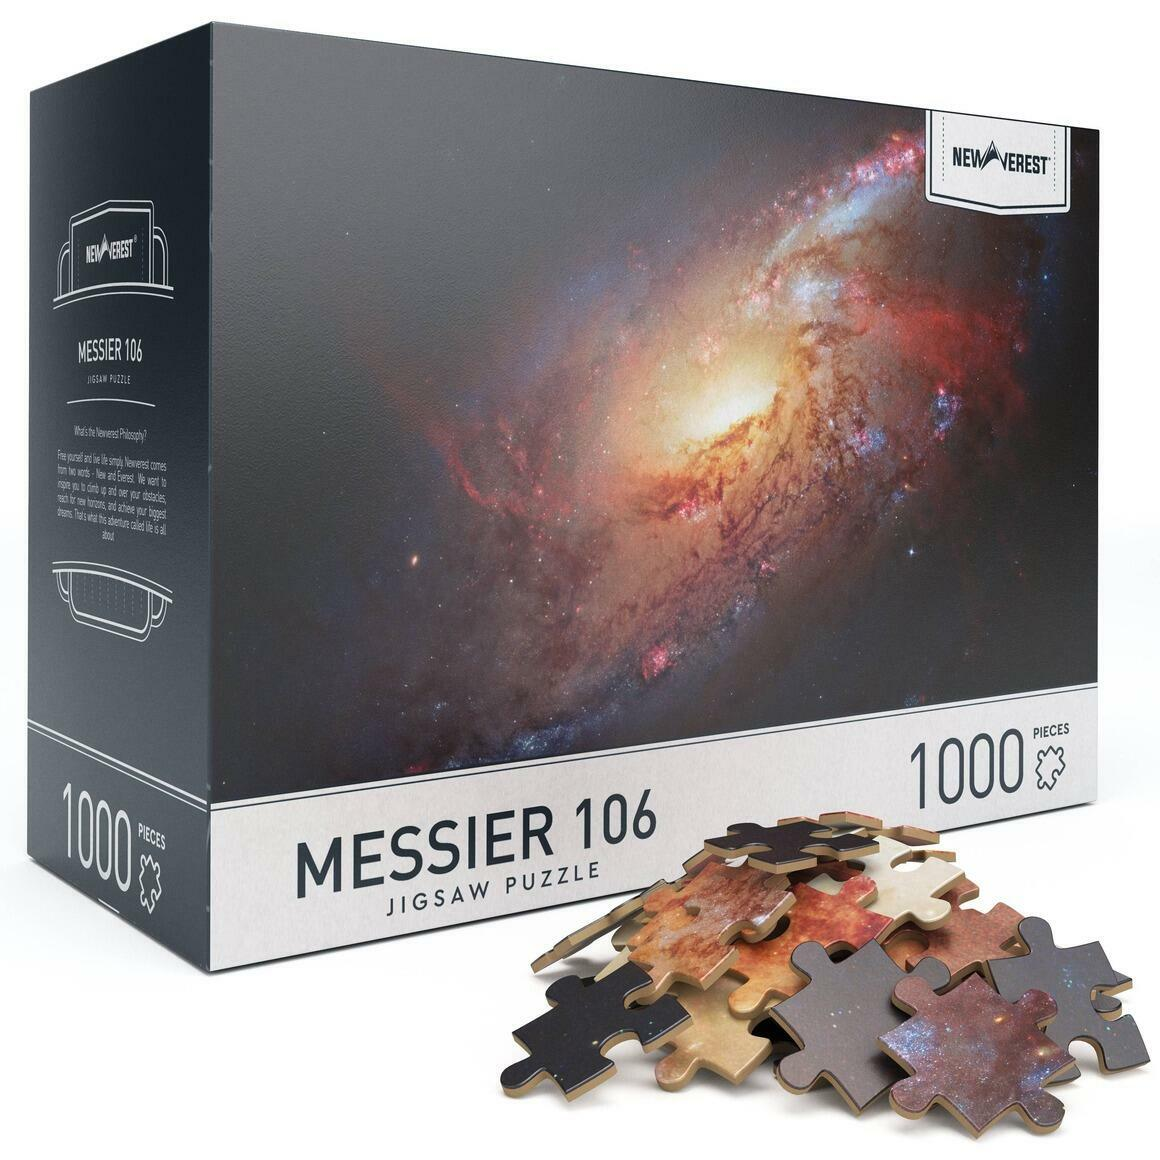 1000 pcs Newverest Messier 106 Jigsaw Puzzle | Trada Marketplace